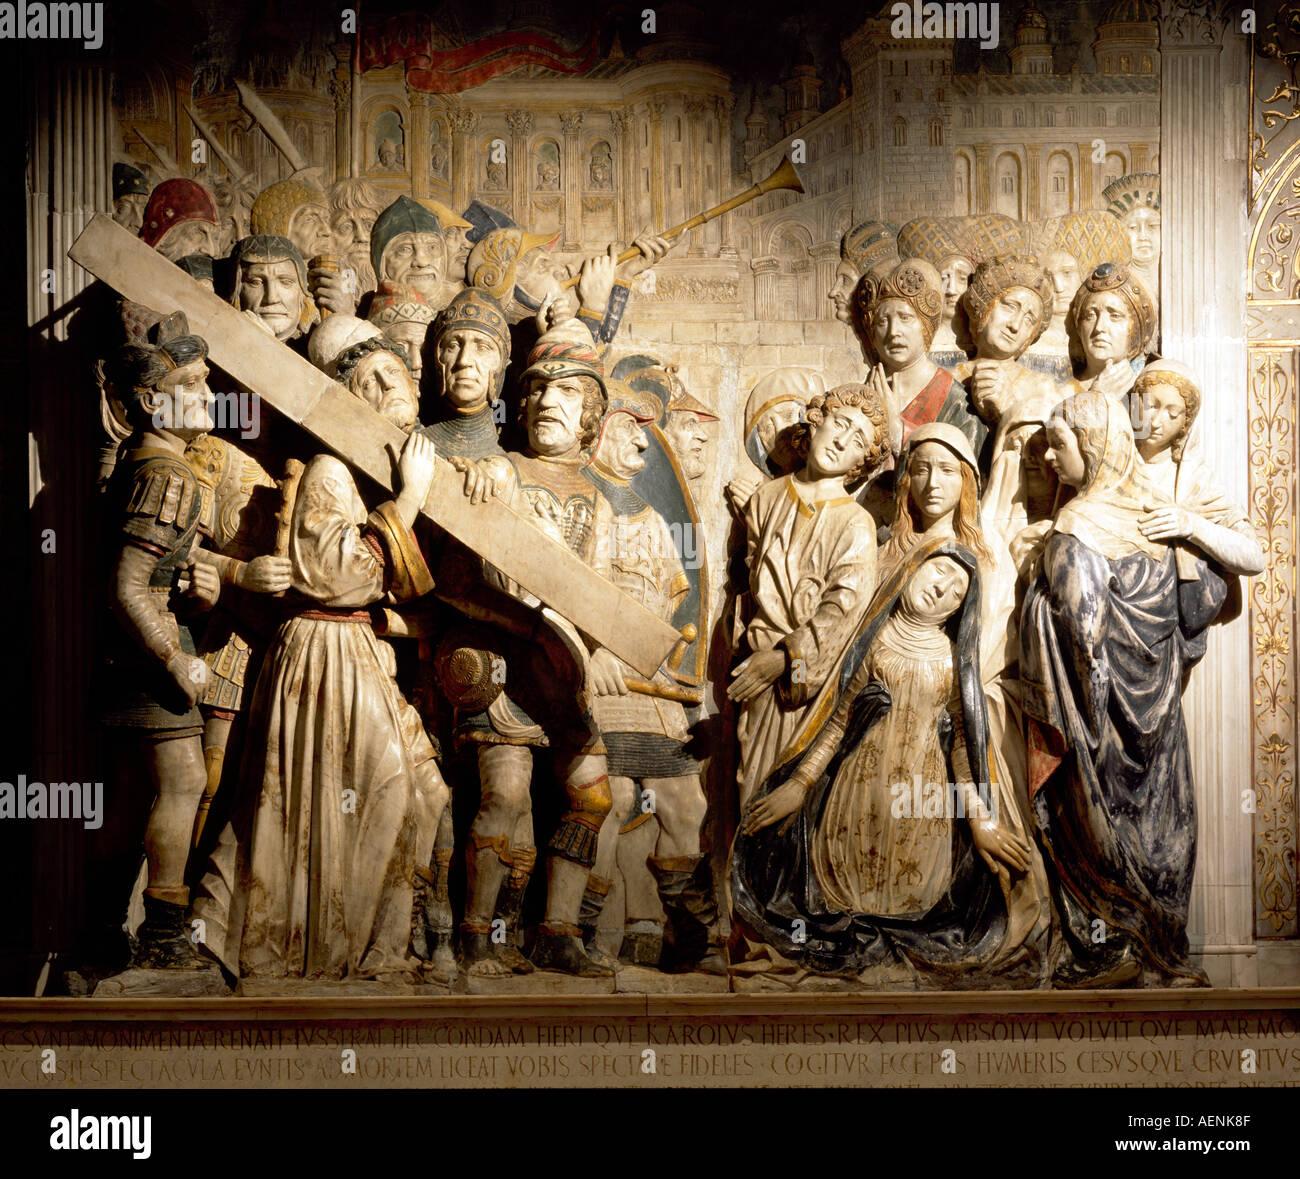 Avignon, St-Didier, Kreuztragungsgruppe von Francesco Laurana, 1478